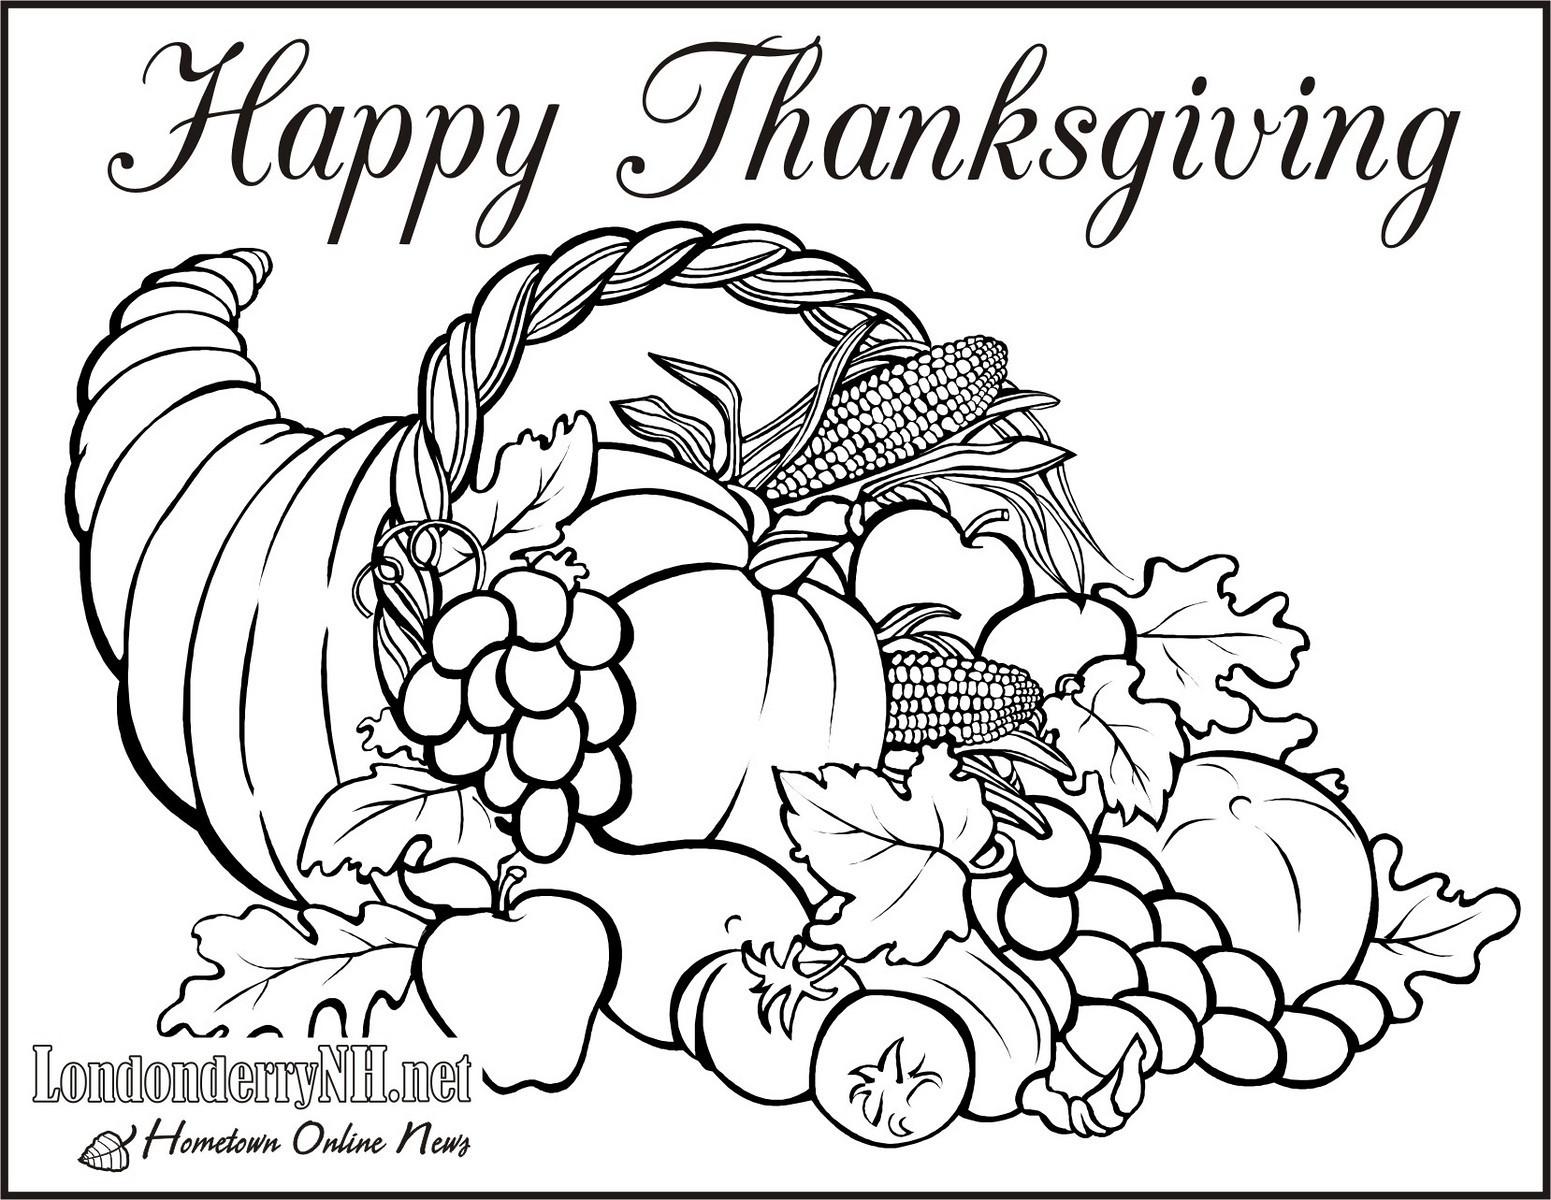 Londonderry Turkey Wanderings, Thanksgiving Coloring Books – Londonderry  News